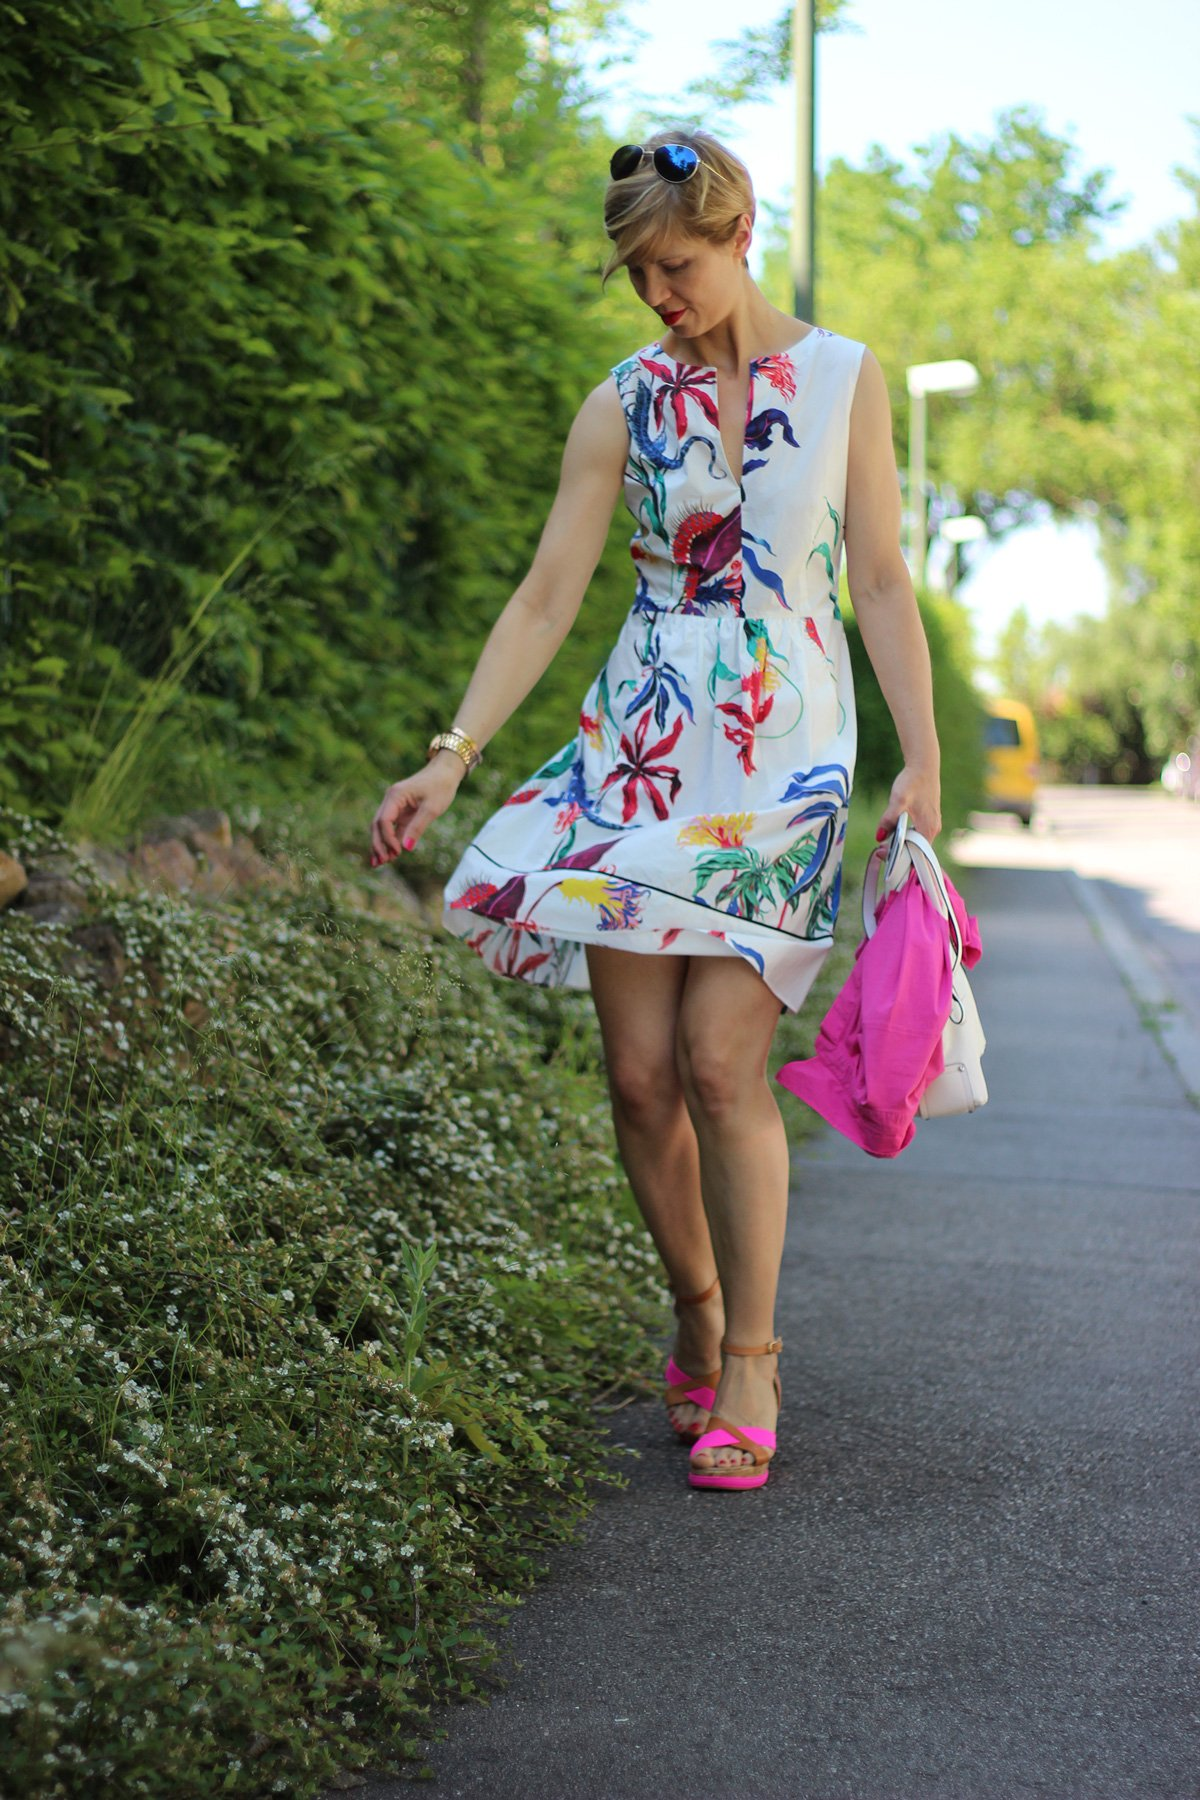 IMG_5954a_Blumenkleid_Flower_Dress_ConnyDoll_AHemadundaHos_Sommerkleid_summerdress